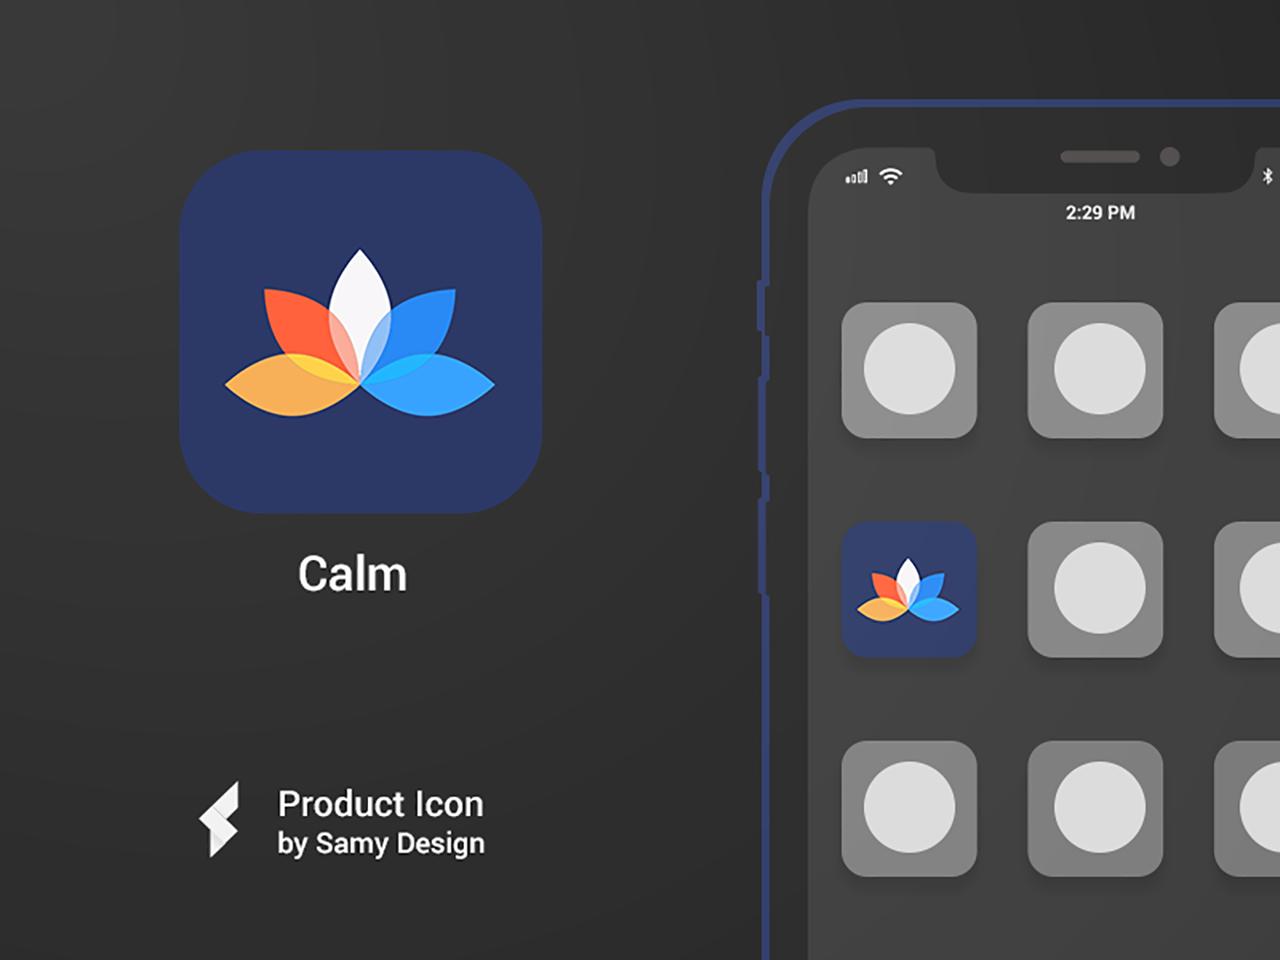 Calm Mediation  - iOS Icon Design mediation calm ios iosicon icon icon artwork iosapp iphone logo illustrator typography gradient color gradient design gradient icon